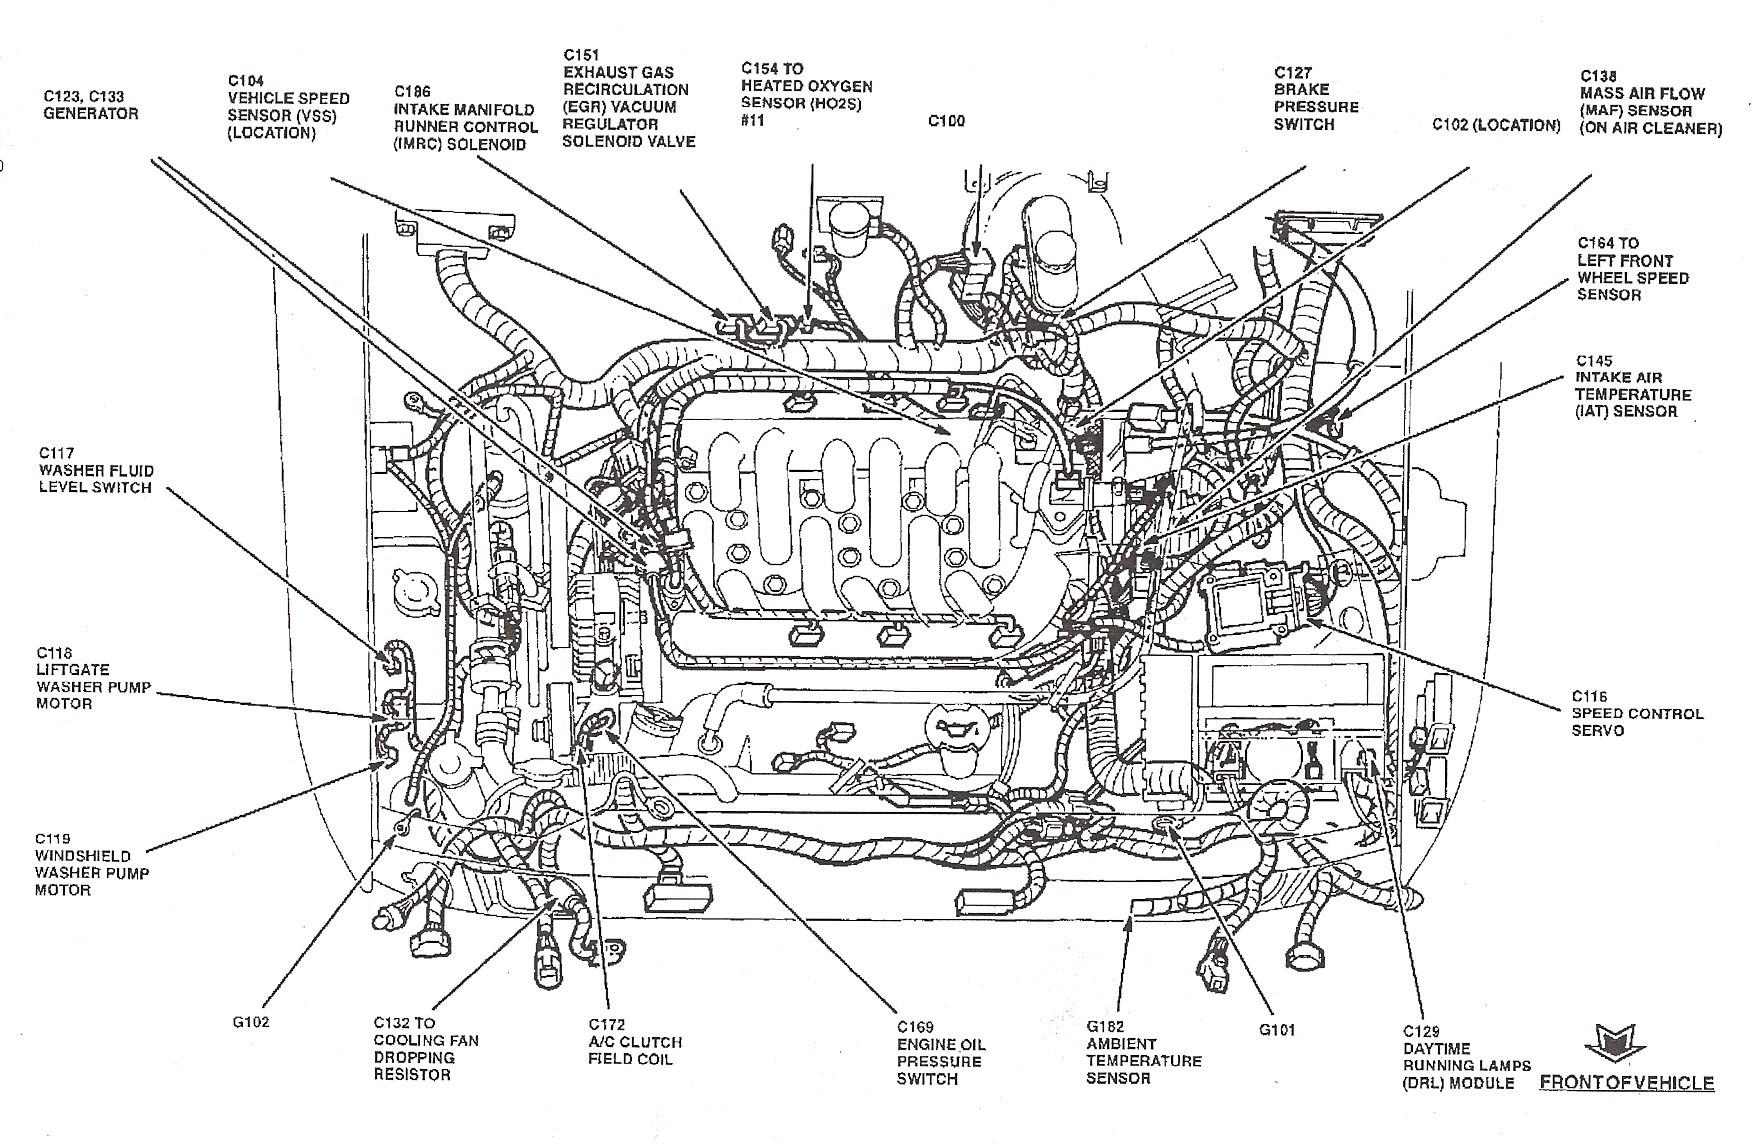 3400 Sfi Engine Cooling System Diagram Wrg 7159] 2002 ford Taurus 3 0 V6 Engine Diagram Of 3400 Sfi Engine Cooling System Diagram